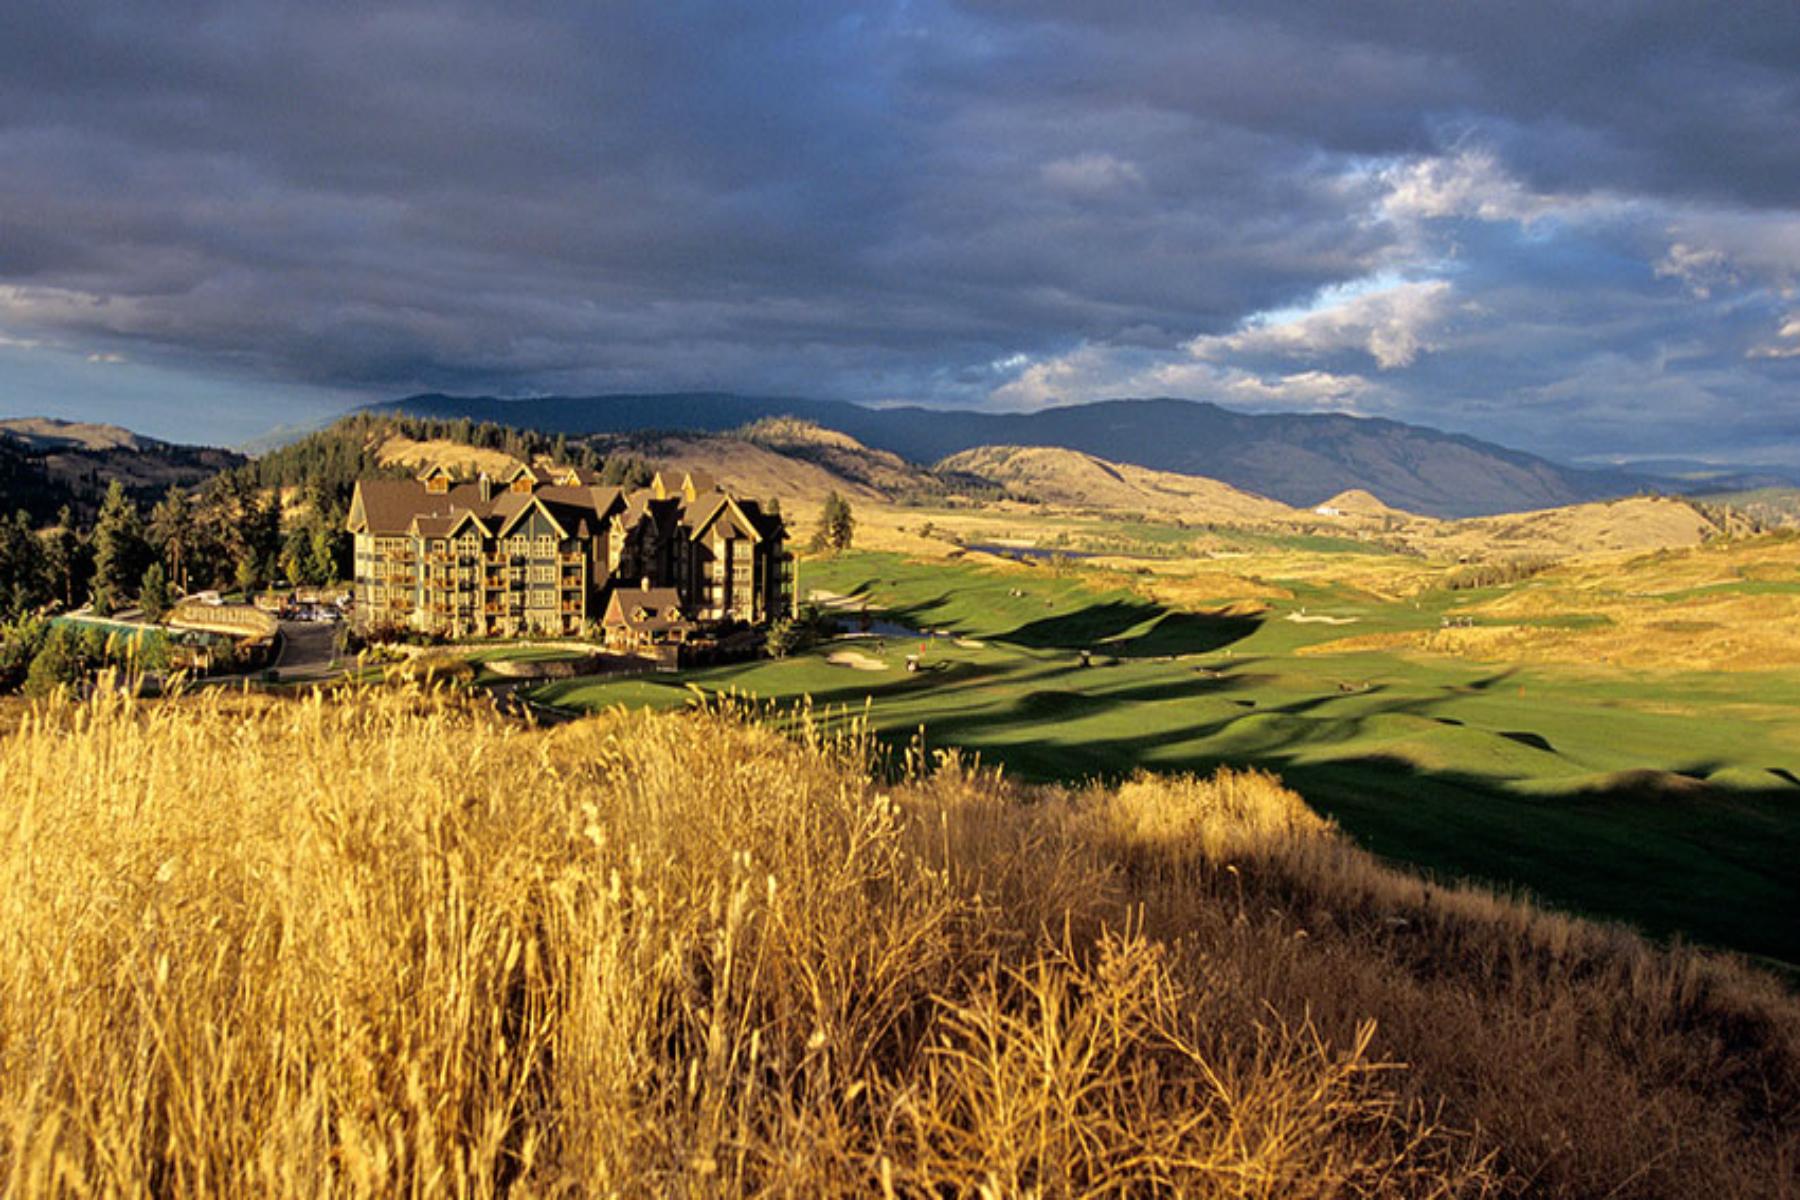 Predator Ridge位于不列颠哥伦比亚省阳光明媚的Okanagan山谷,属于加拿大最大的度假胜地之一